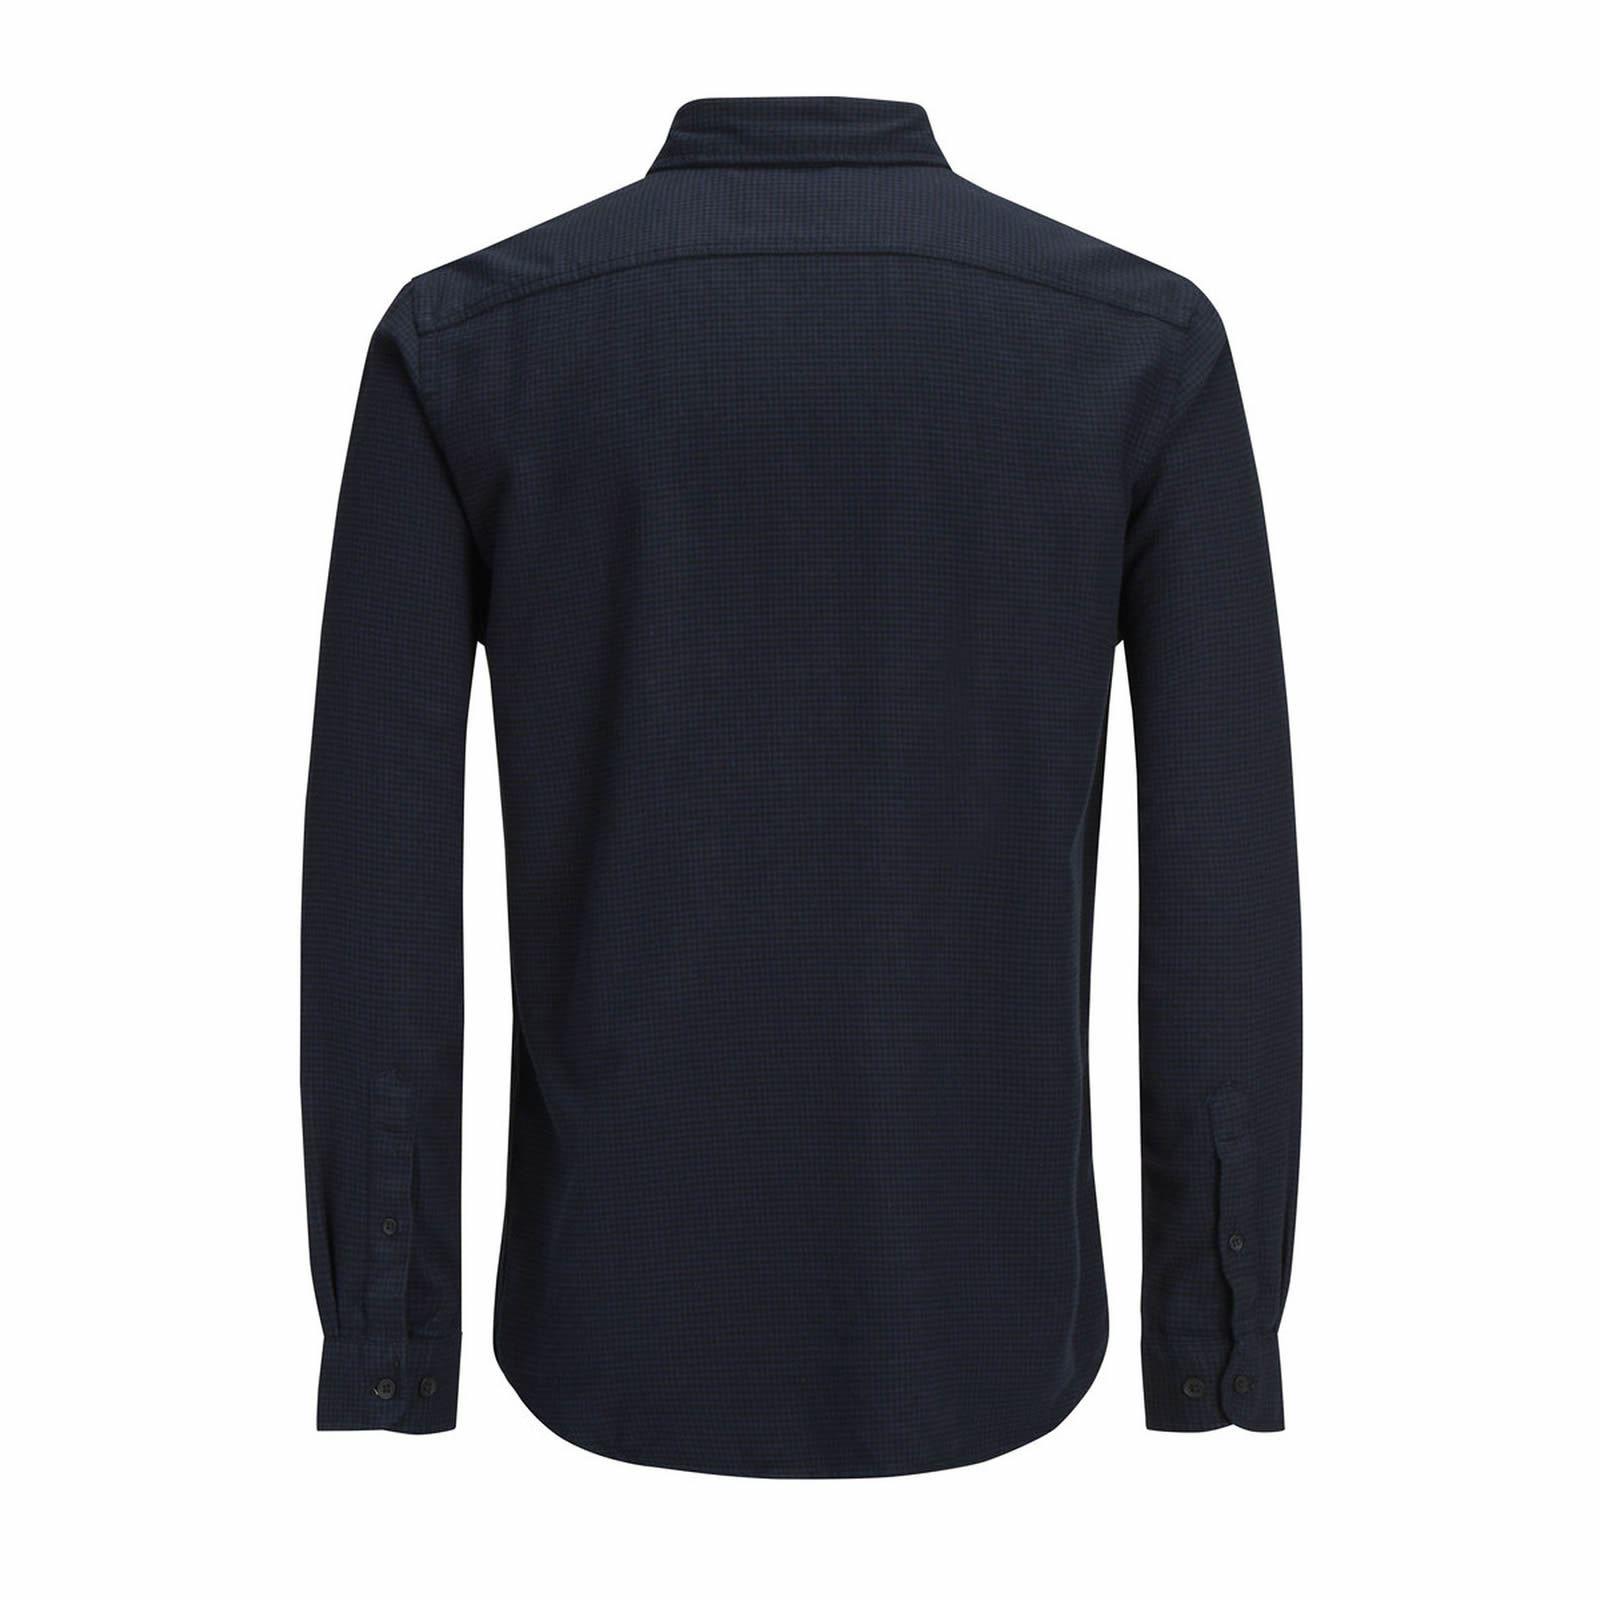 Jack Jones & Jones Jack Eskild Mens Check Shirt Long Manche CollaRouge Cotton Casual Shirt 4ff012